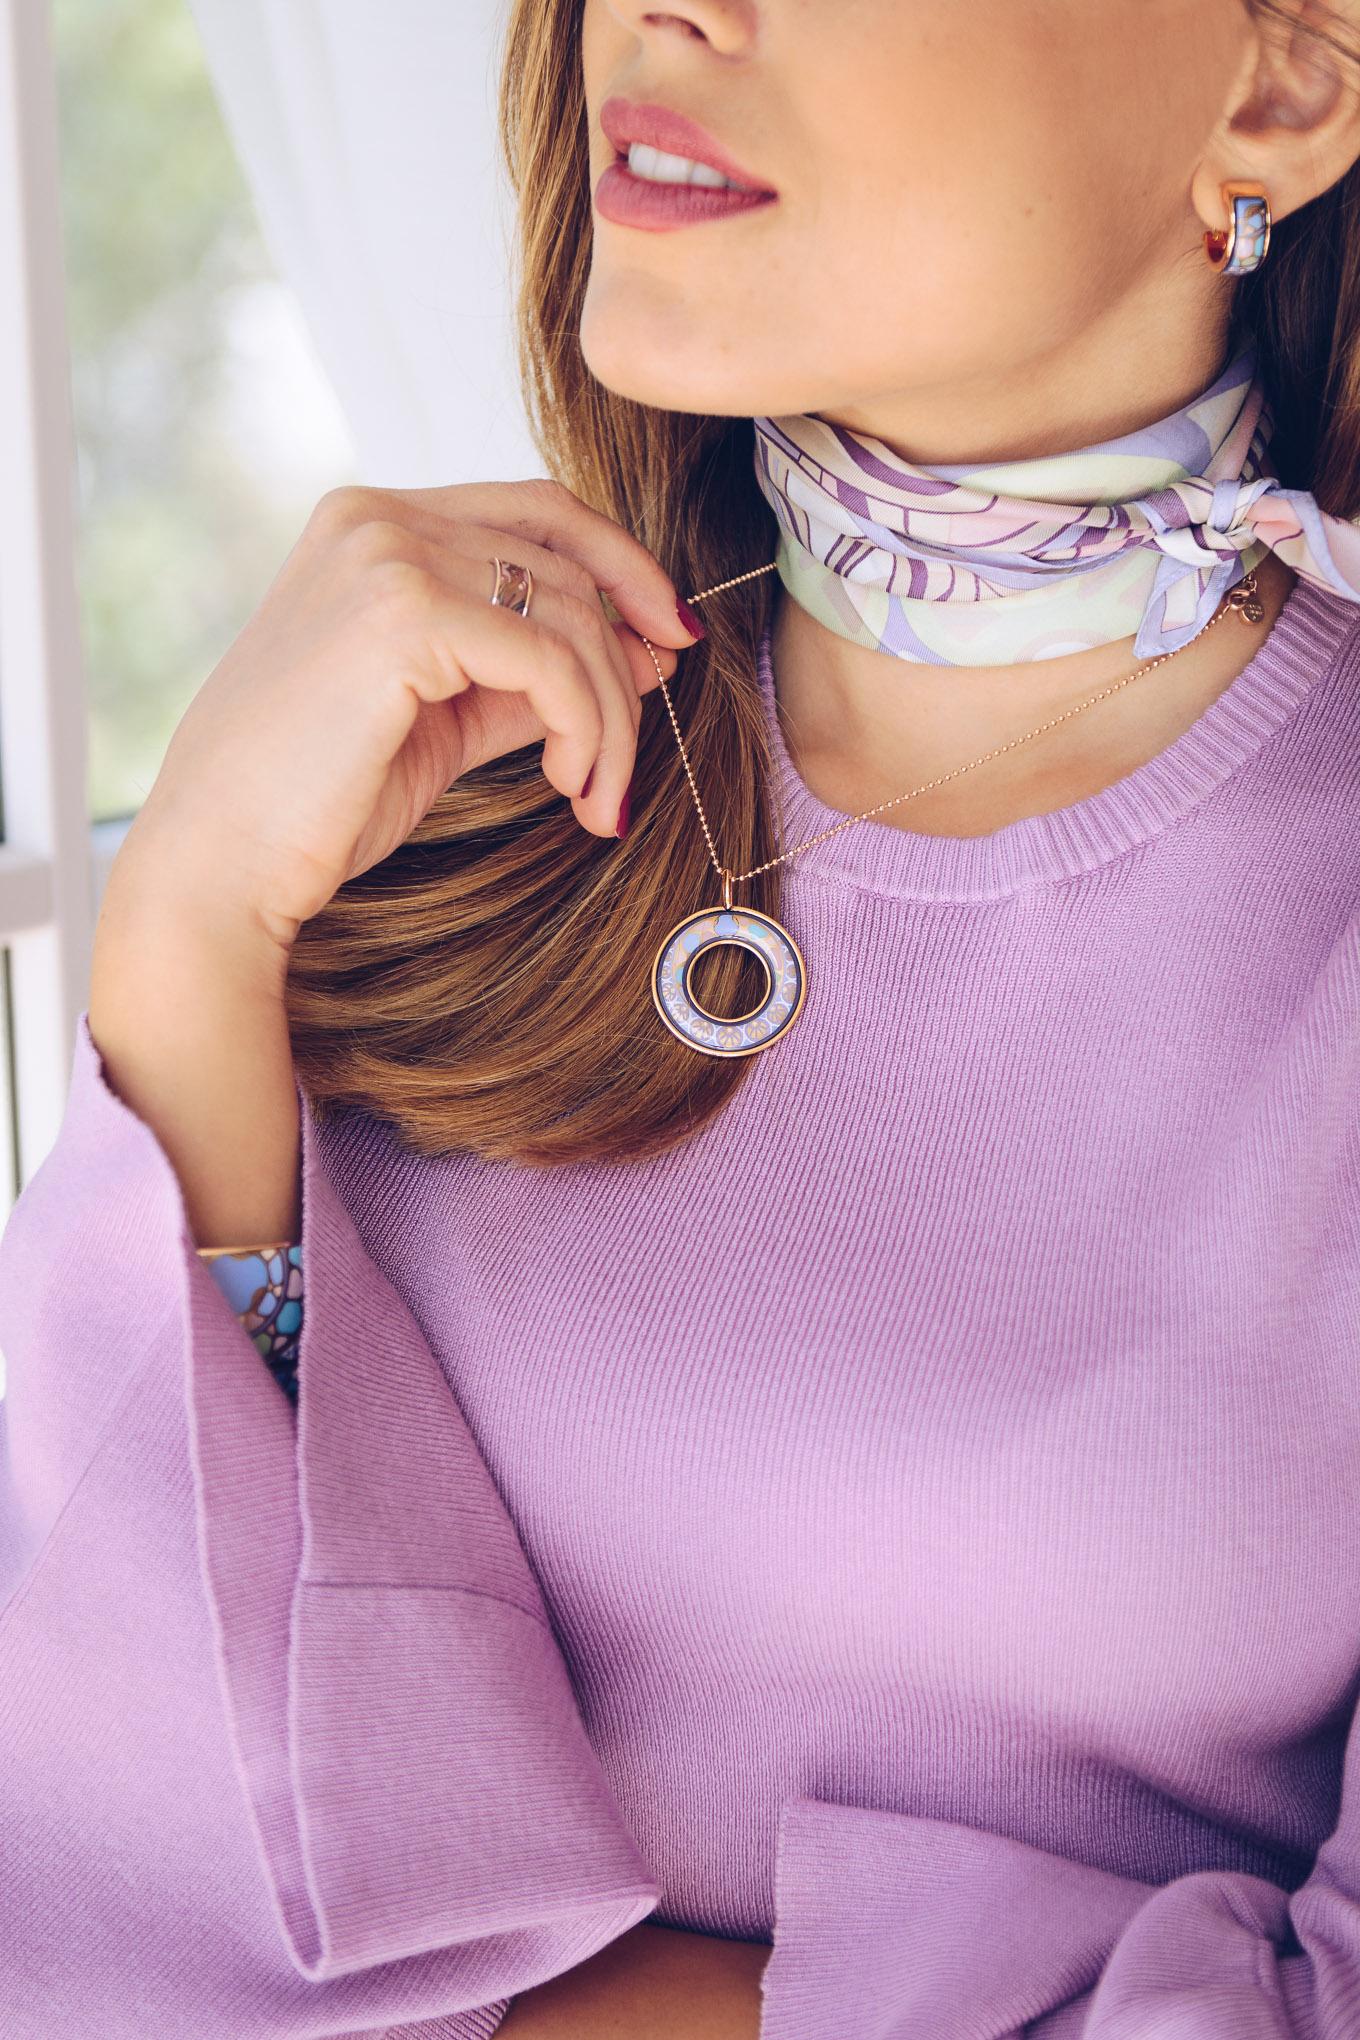 Freywille Poésie d'amour jewellery